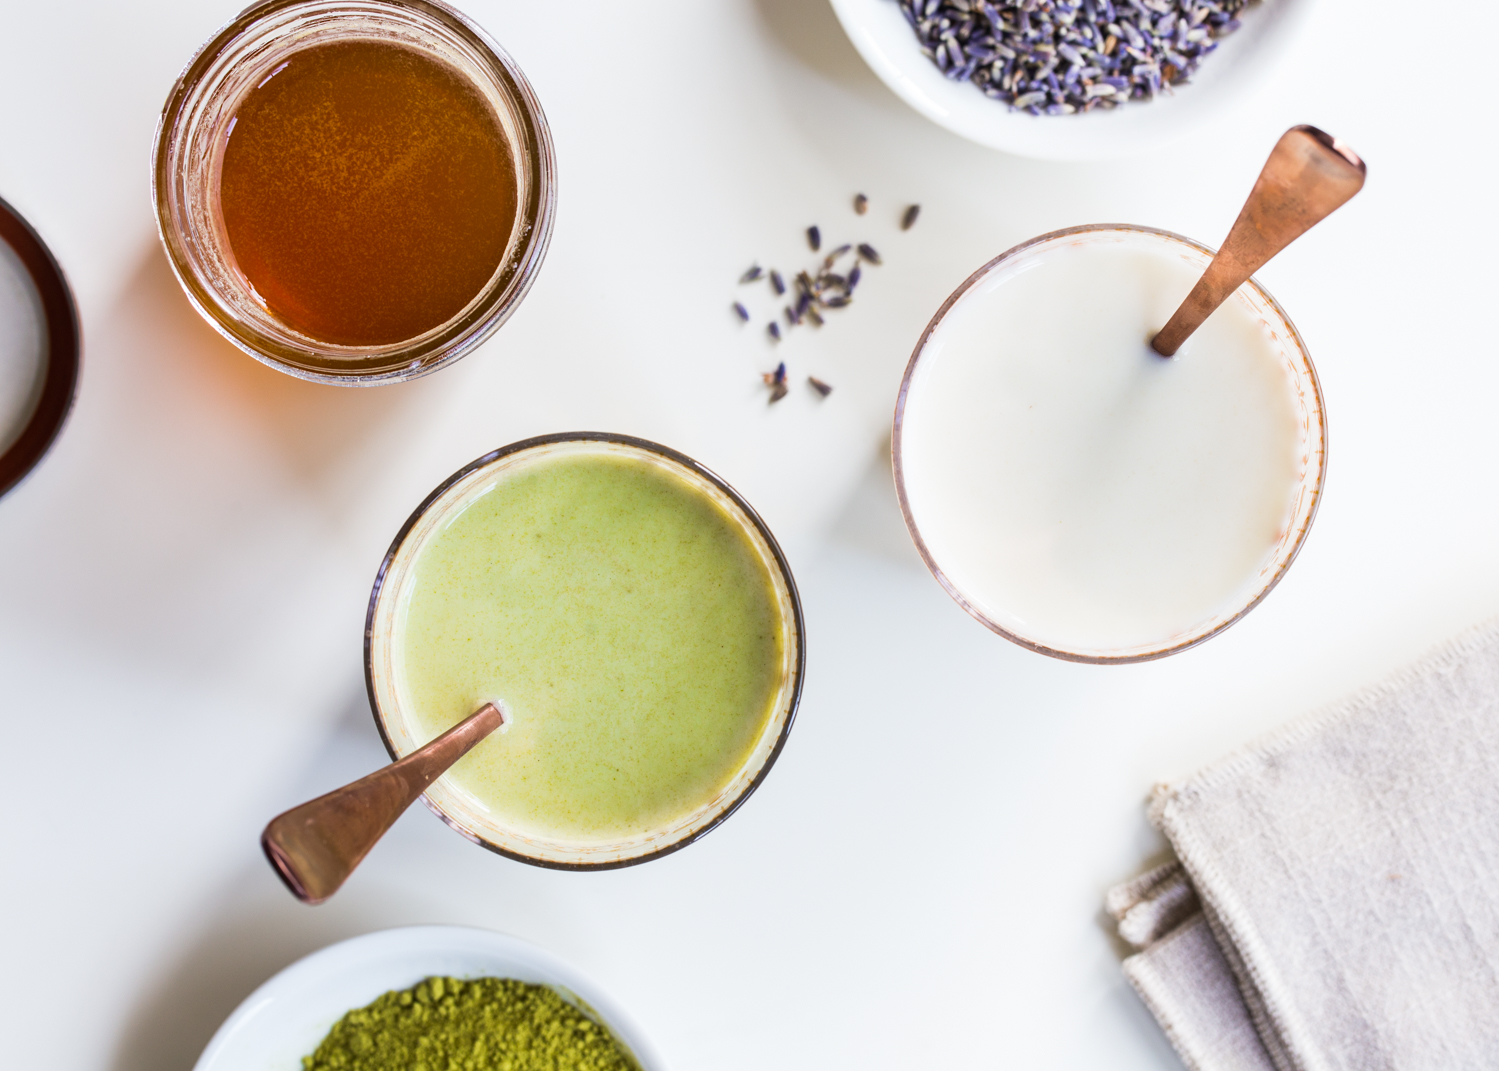 Flavored Milk - Lavender Honey Milk with a Matcha Twist